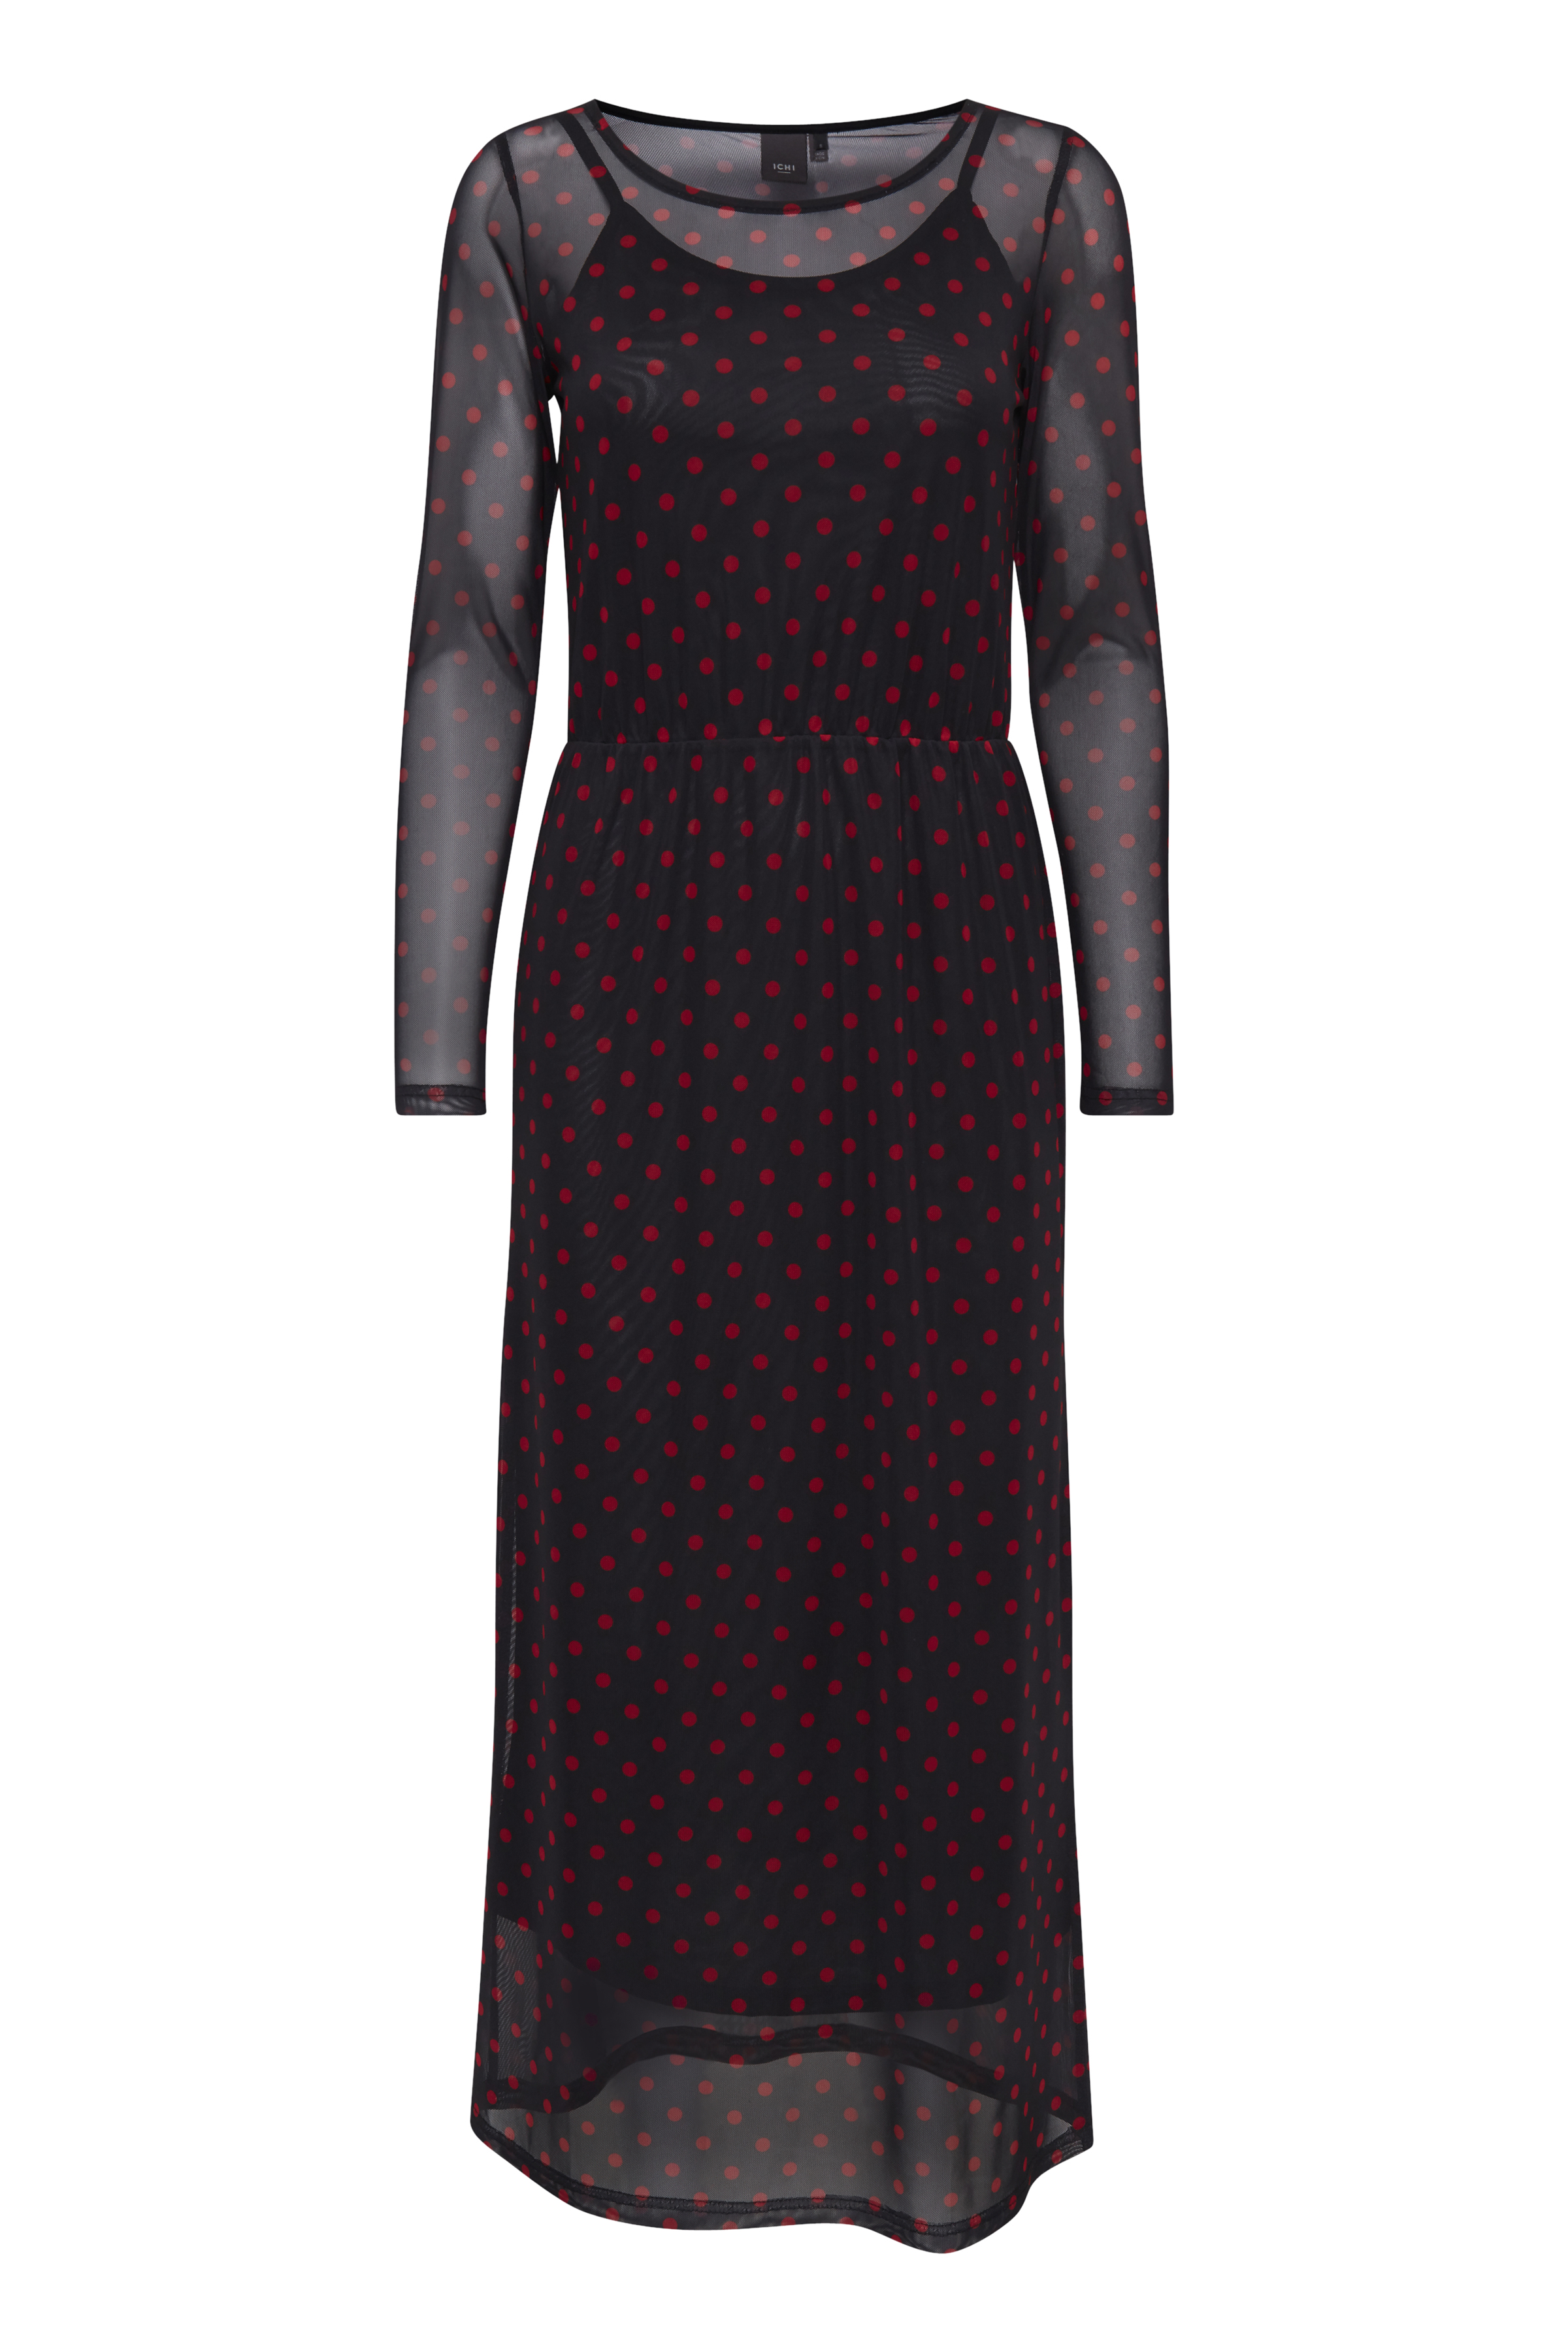 Ichi Dame Jersey jurk - Tapioca